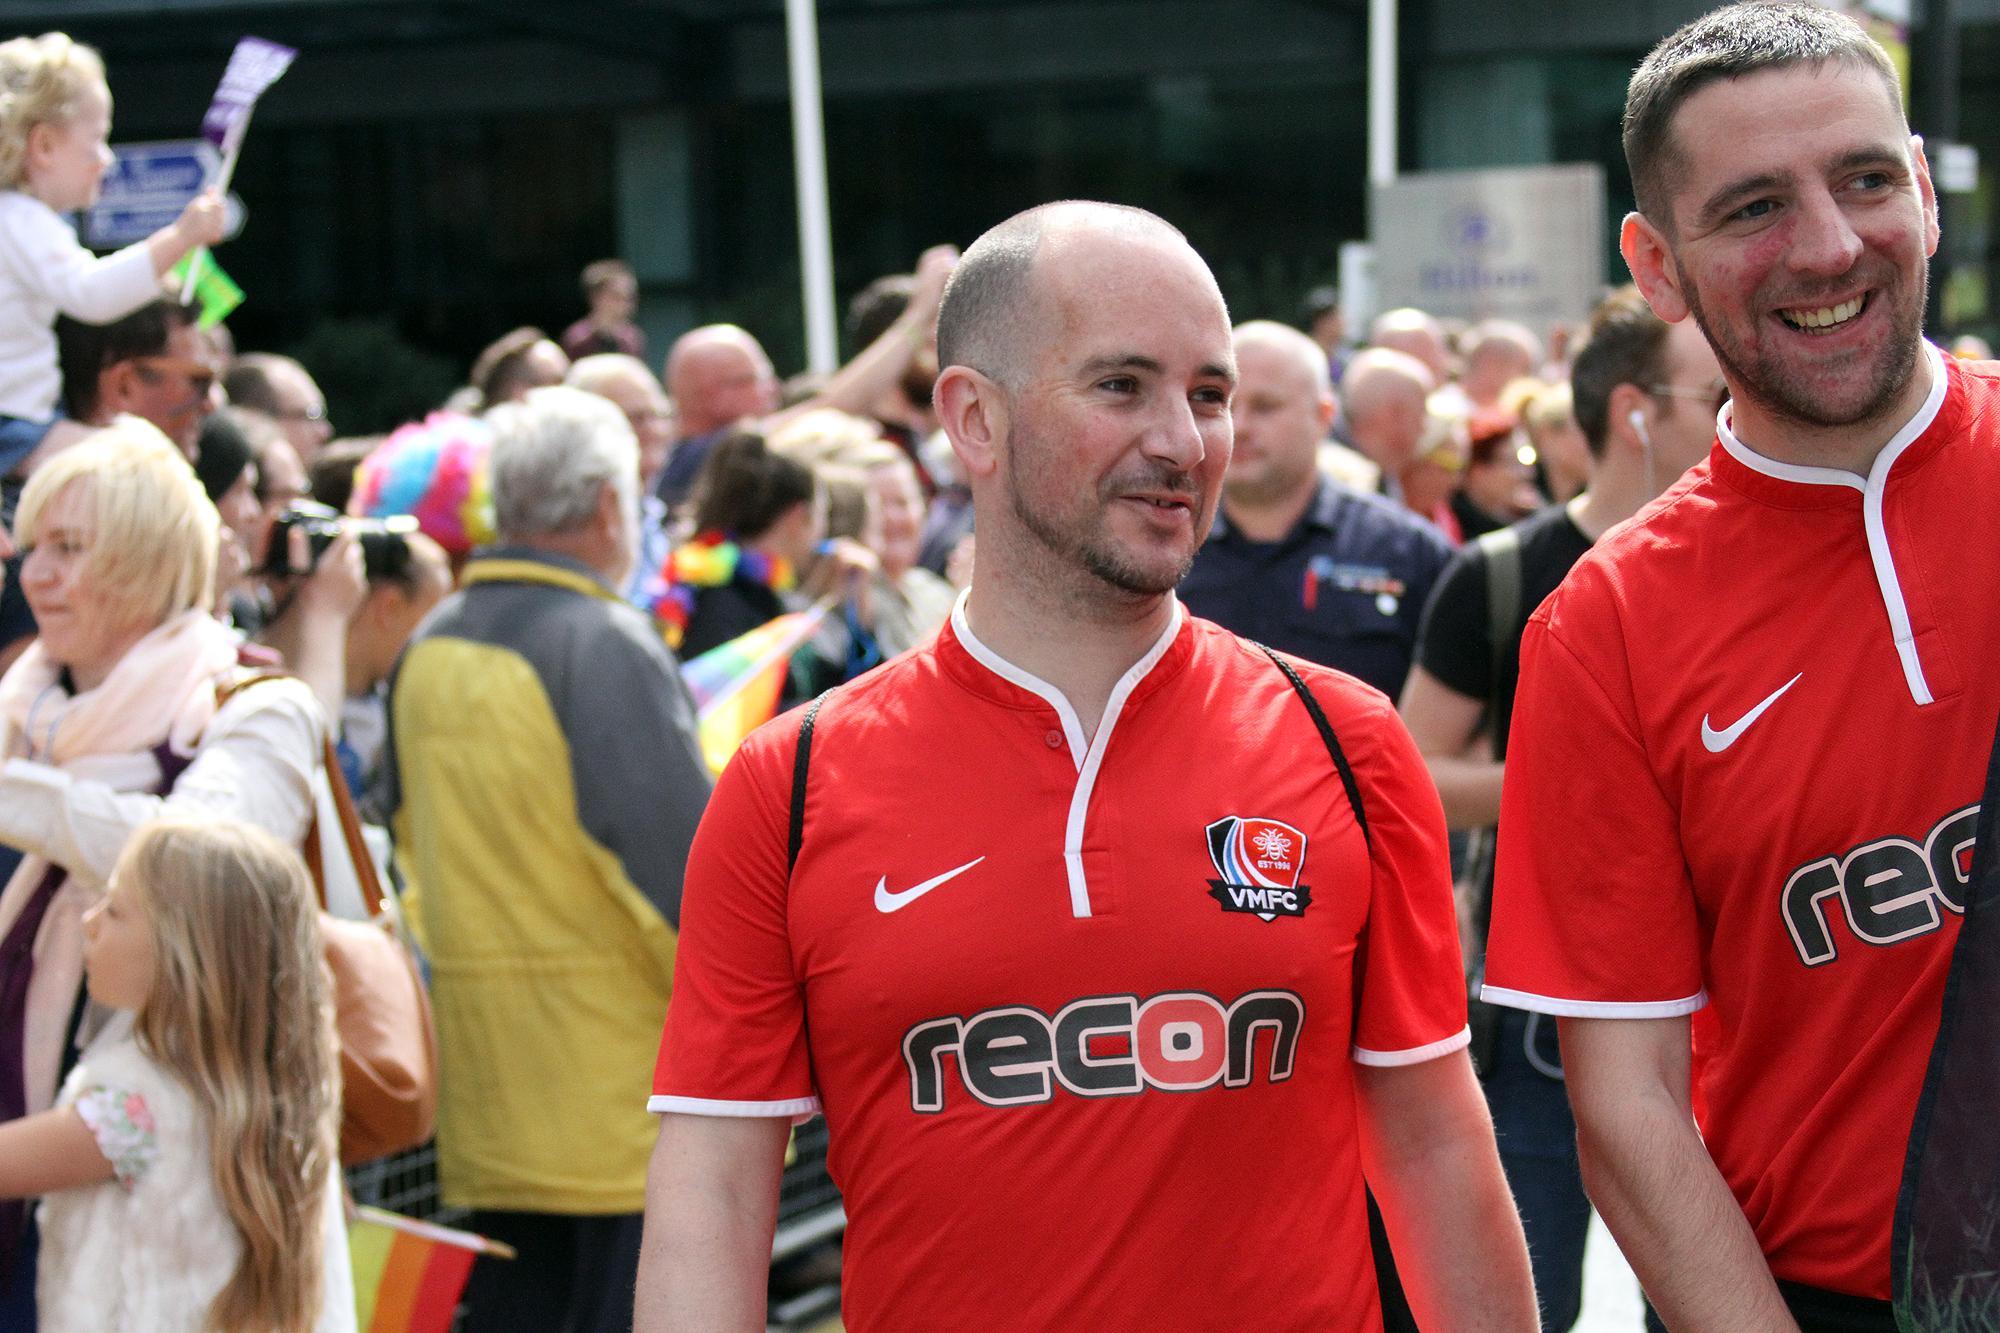 VMFC at Manchester Pride parade 2015  (5).jpg